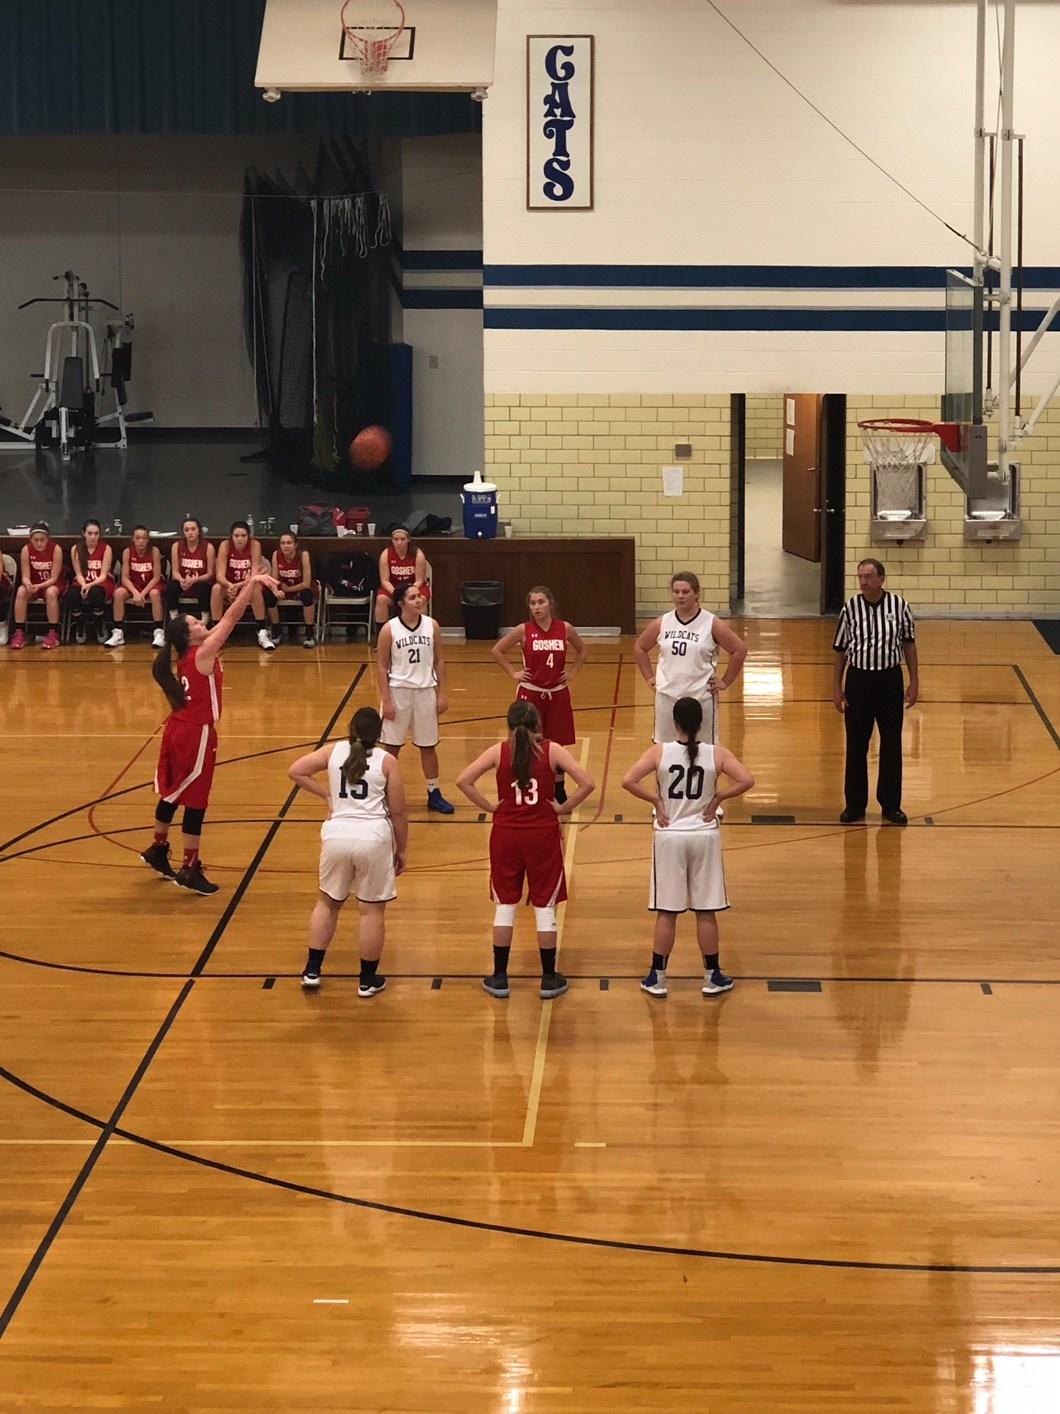 8th grade girls basketball game